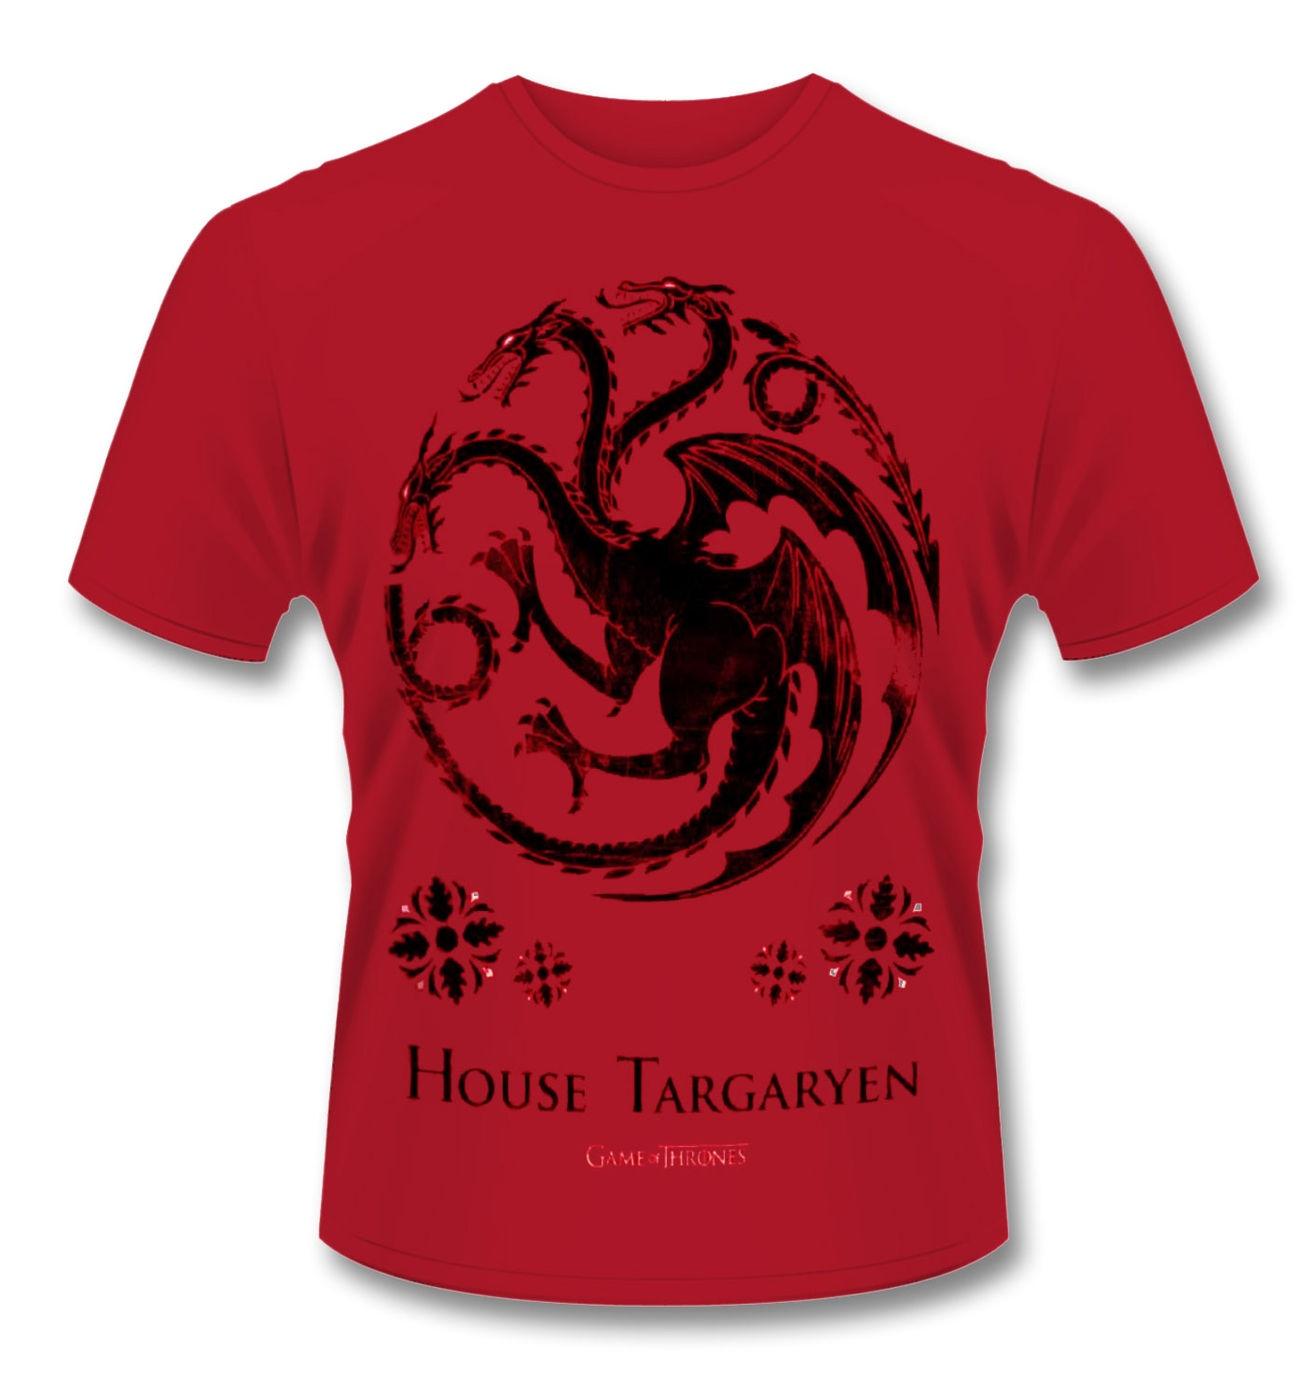 Official Game Of Thrones House Targaryen t-shirt